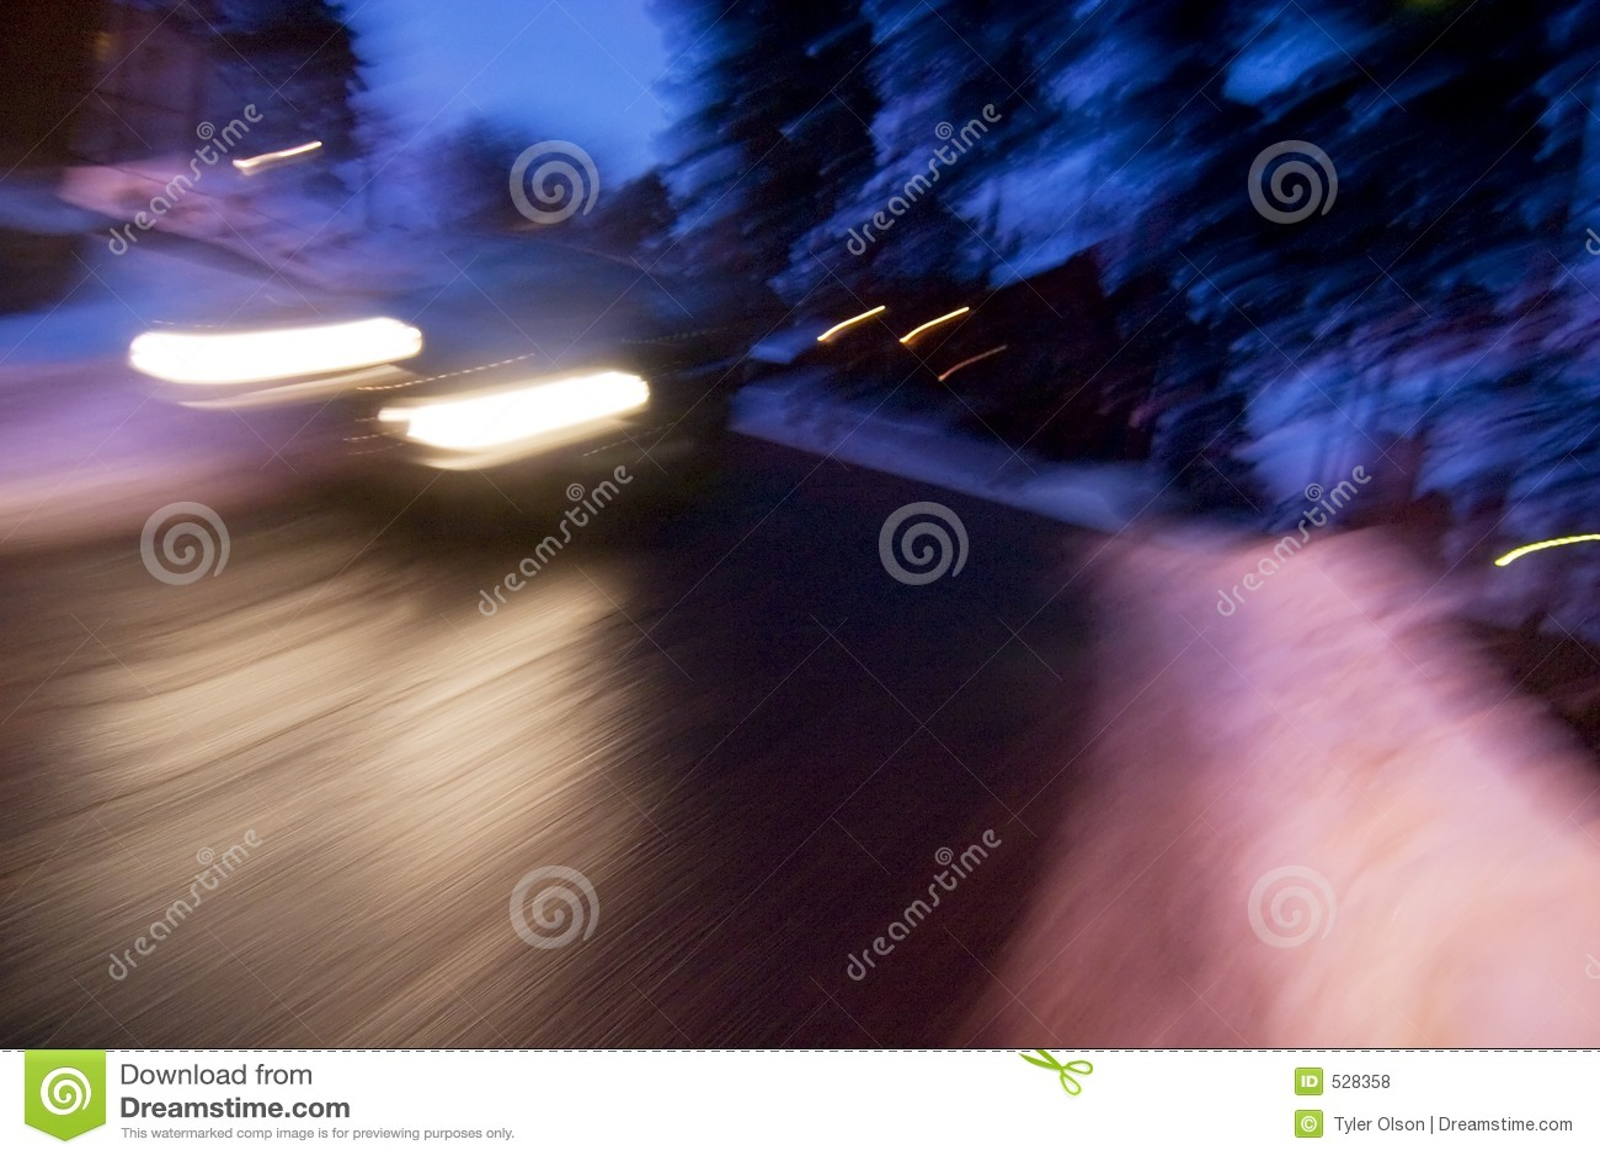 Download 速度冬天 库存照片. 图片 包括有 夜间, 驱动器, 快速, 超现实, 失败, 恐慌, 季节, 惊吓, 加速 - 528358